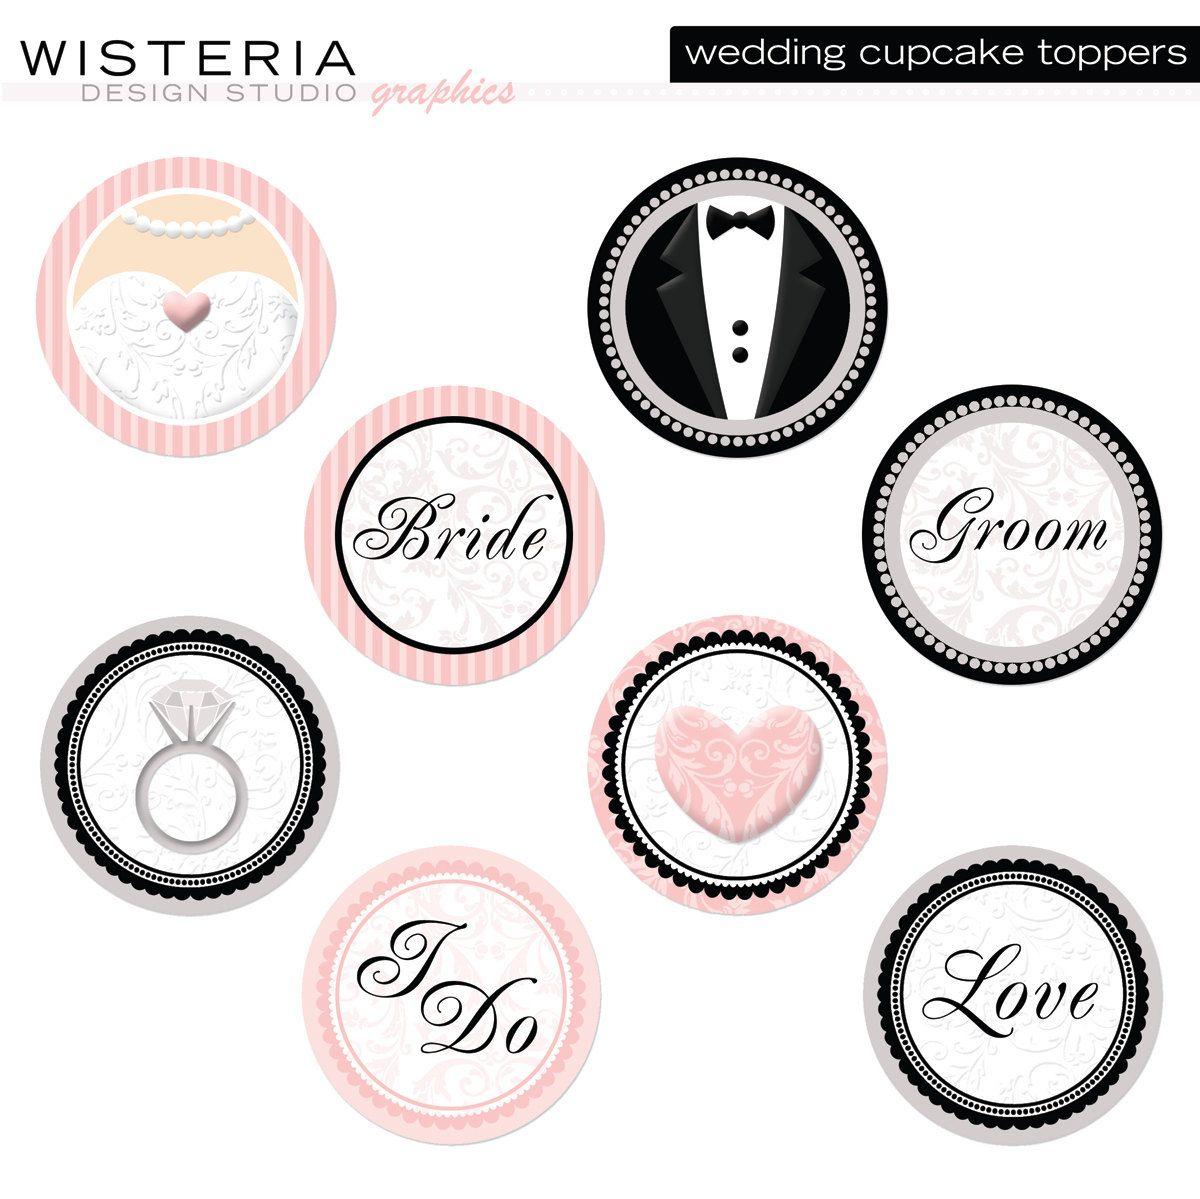 printable cupcake toppers wedding wedding cupcake toppers diy